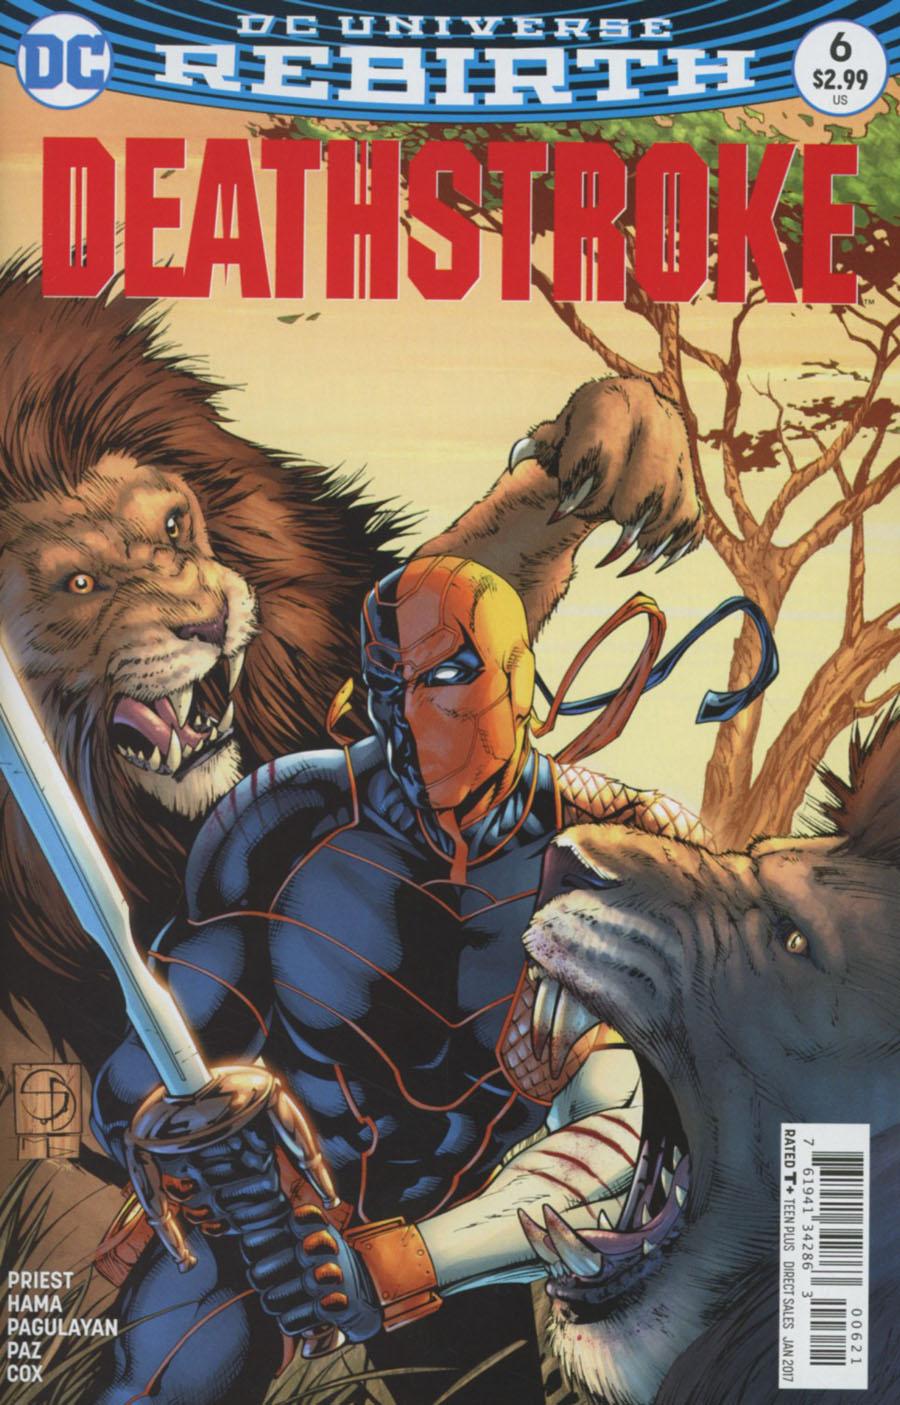 Deathstroke Vol 4 #6 Cover B Variant Shane Davis Cover